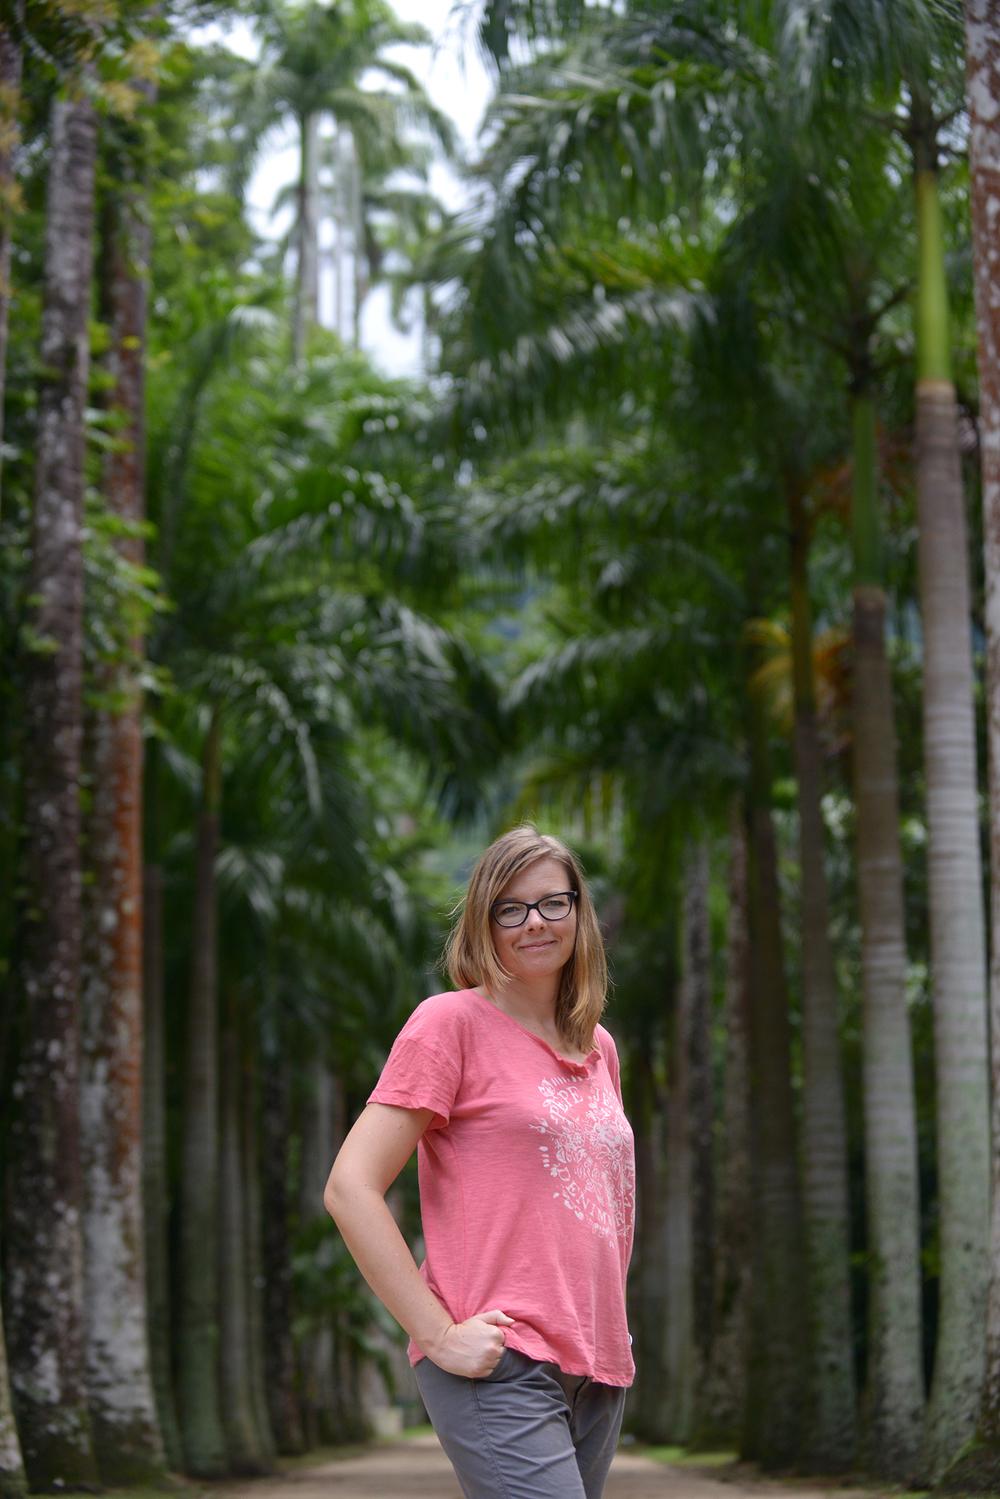 Mira Jalomies, Rio de Janeiro, matkablogi, matka